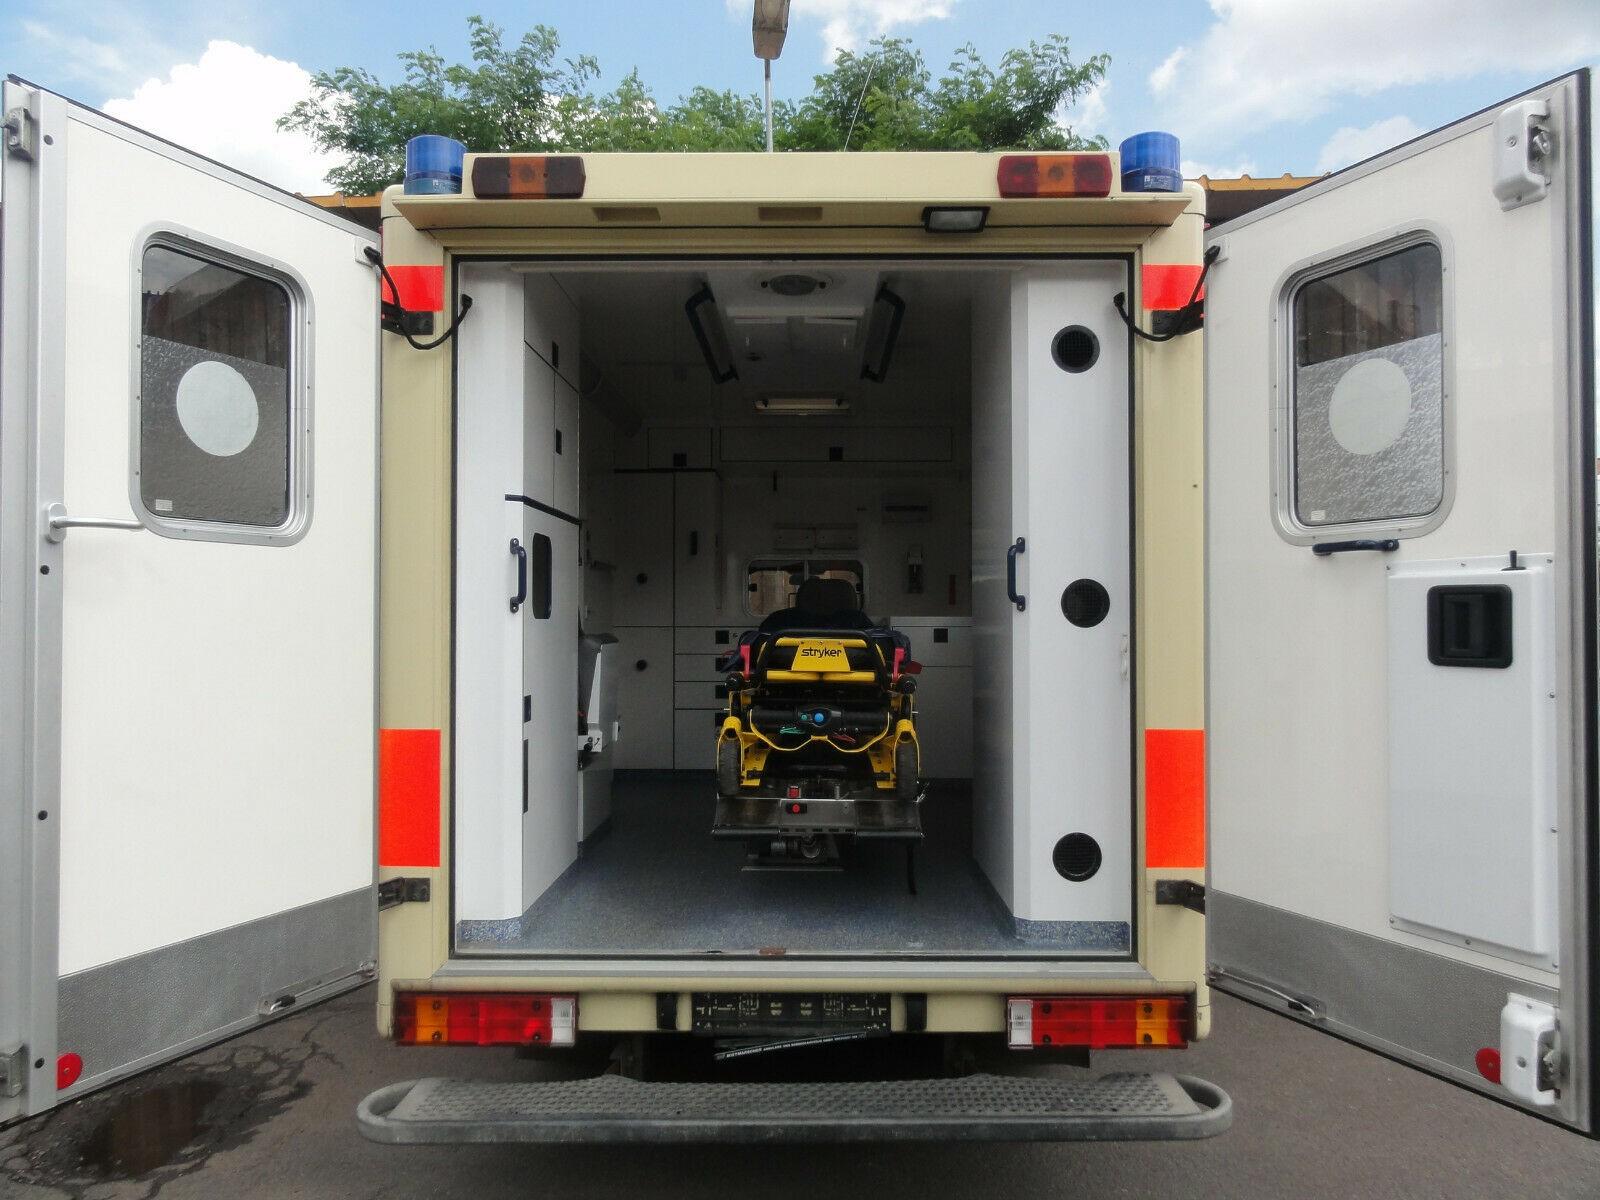 Mercedes Ambulance for sale - MBBY71